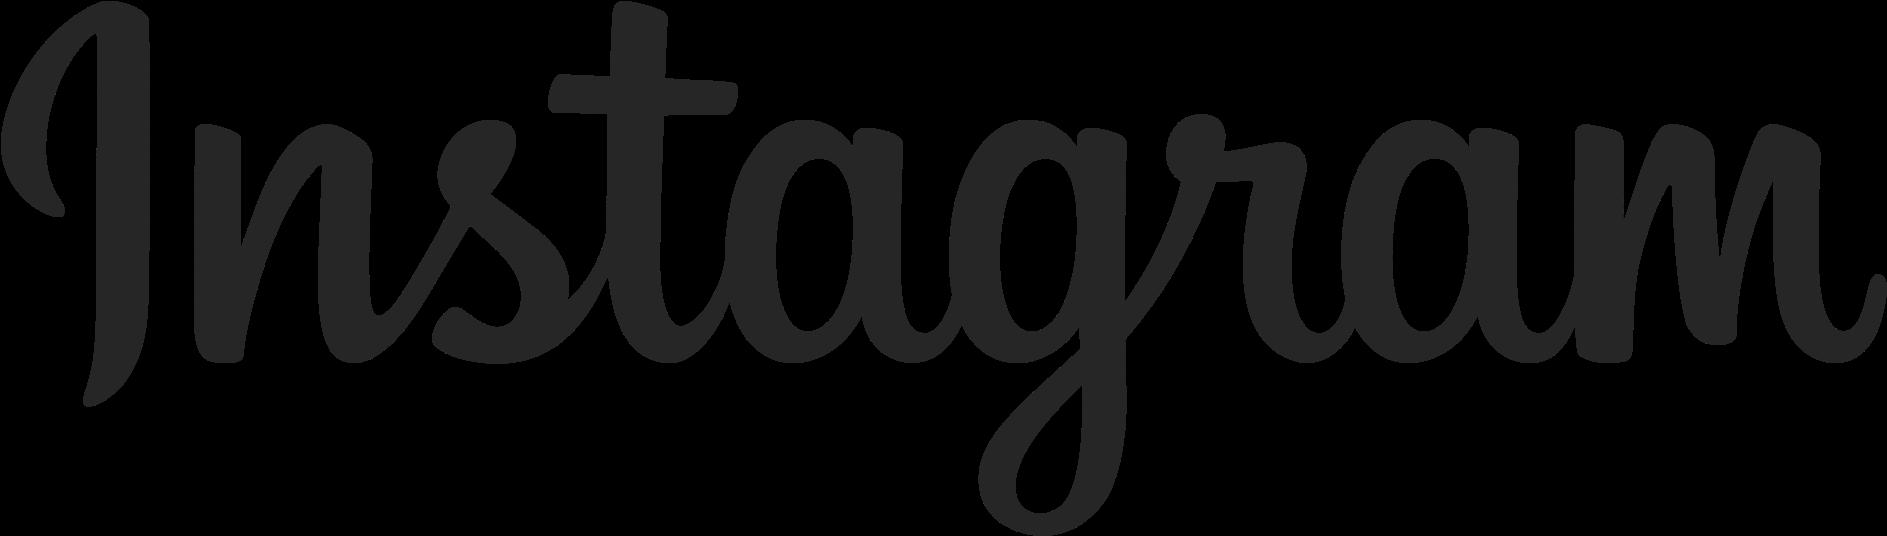 Download Instagram Png Logo Instagram Word Logo Png Png Image With No Background Pngkey Com